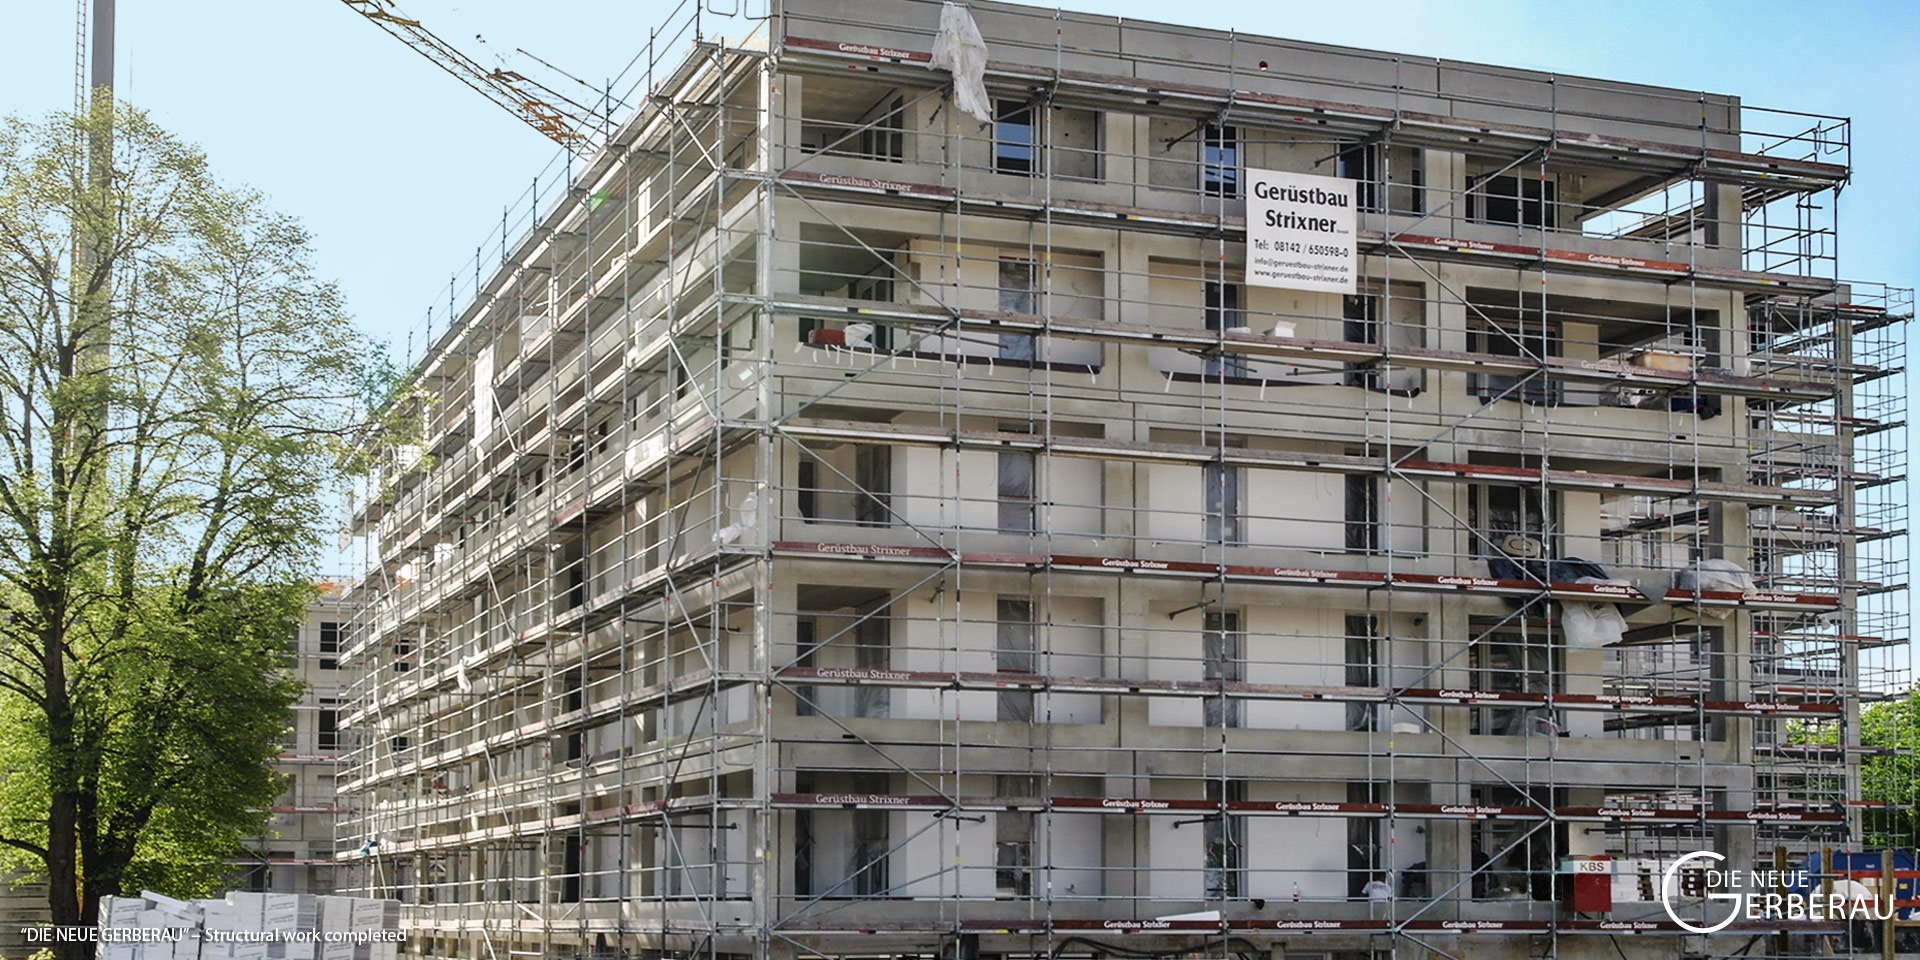 """DIE NEUE GERBERAU"" in Munich-Allach: Structural work completed"